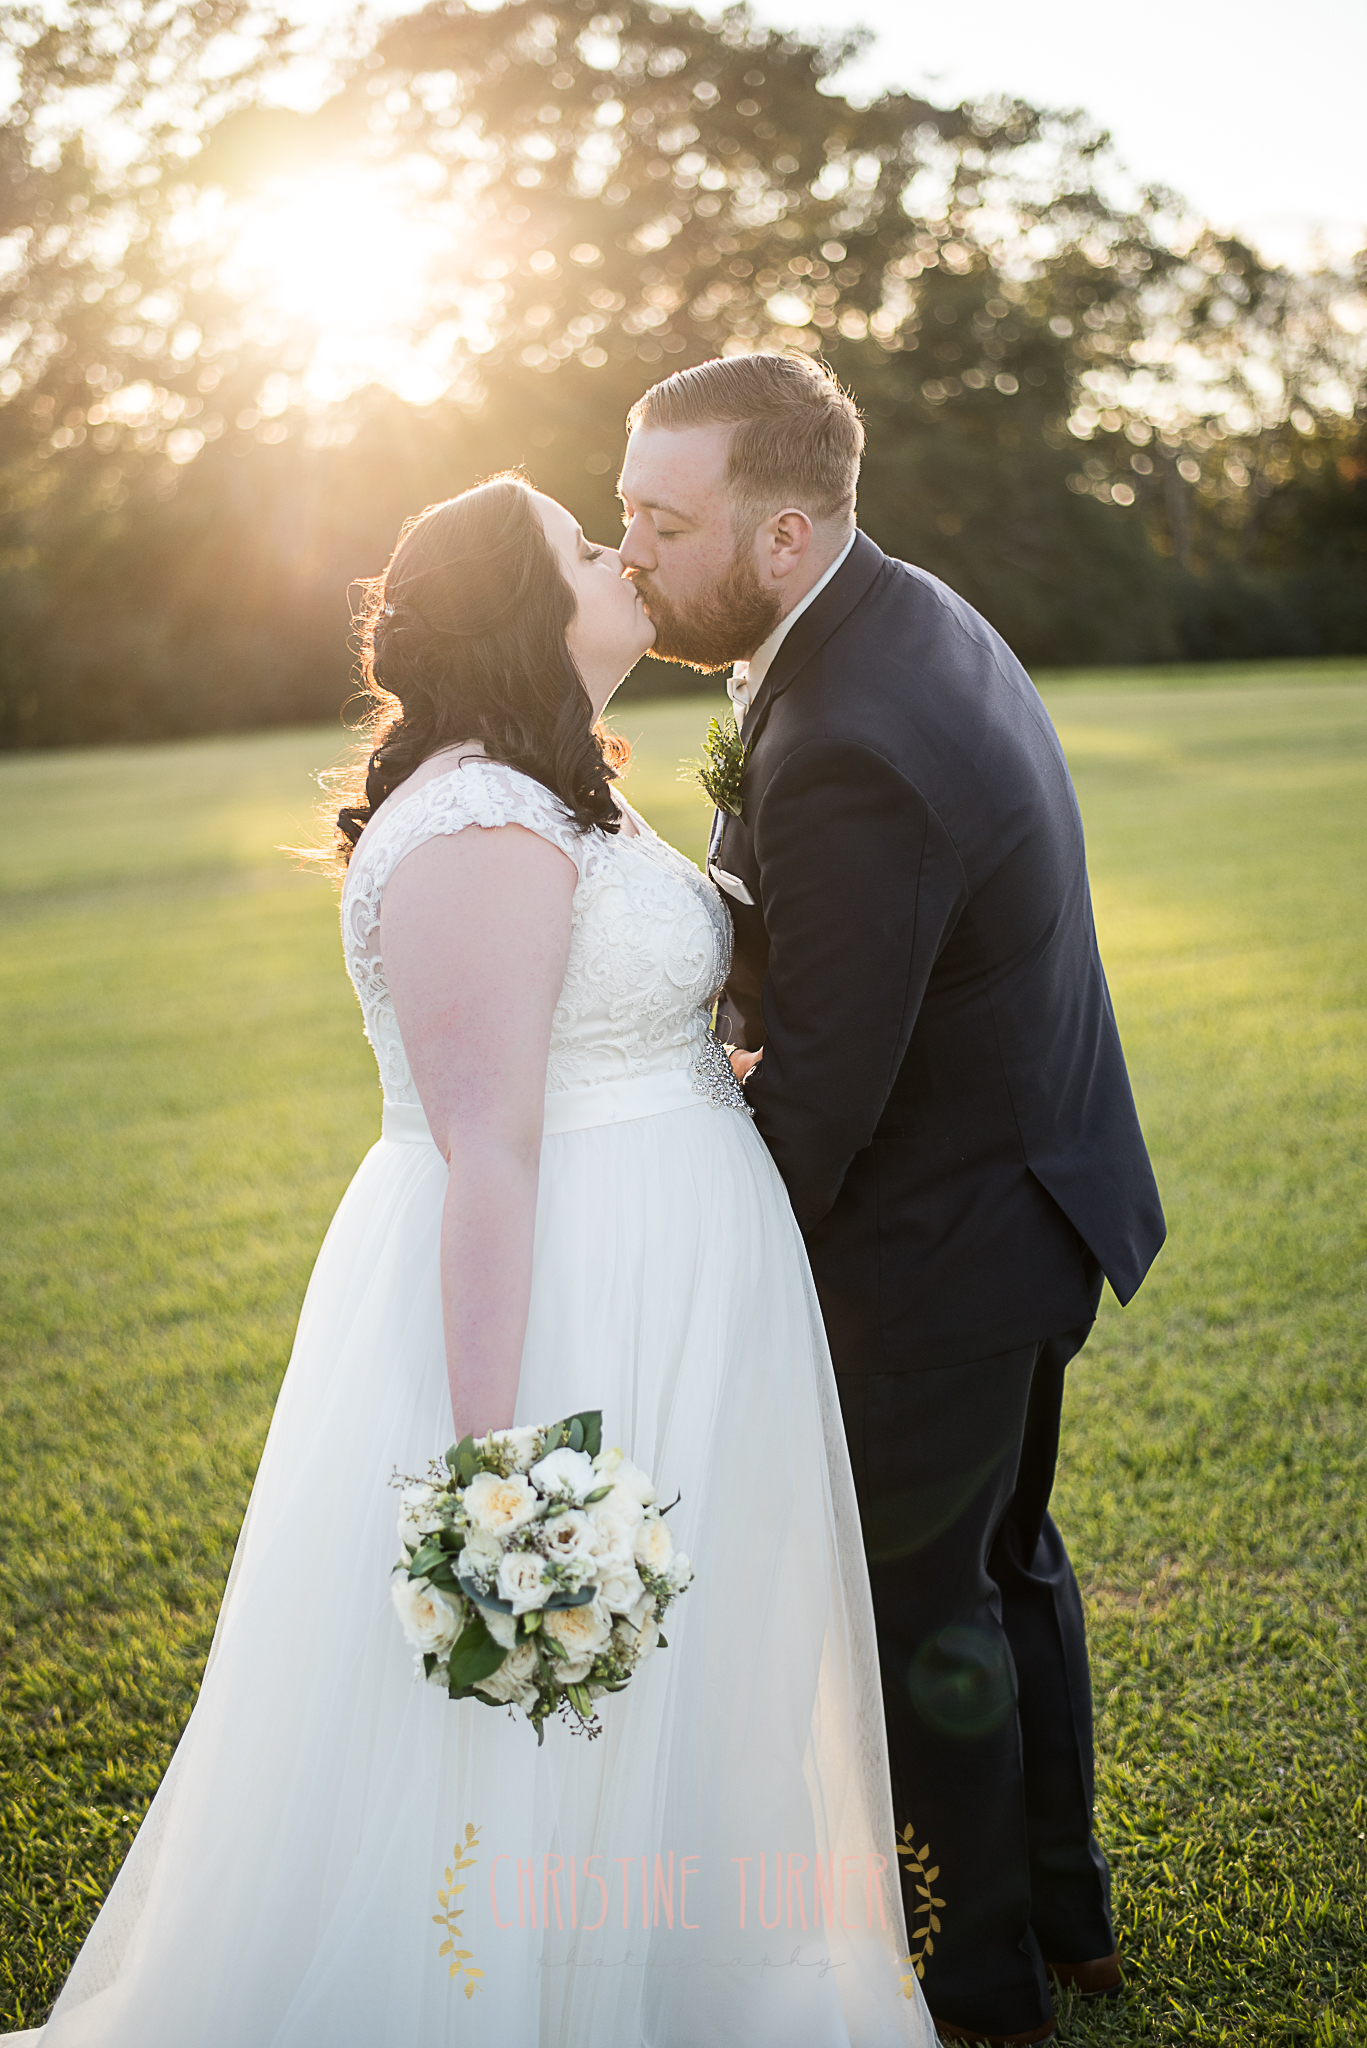 J&D Wedding (13 of 24)